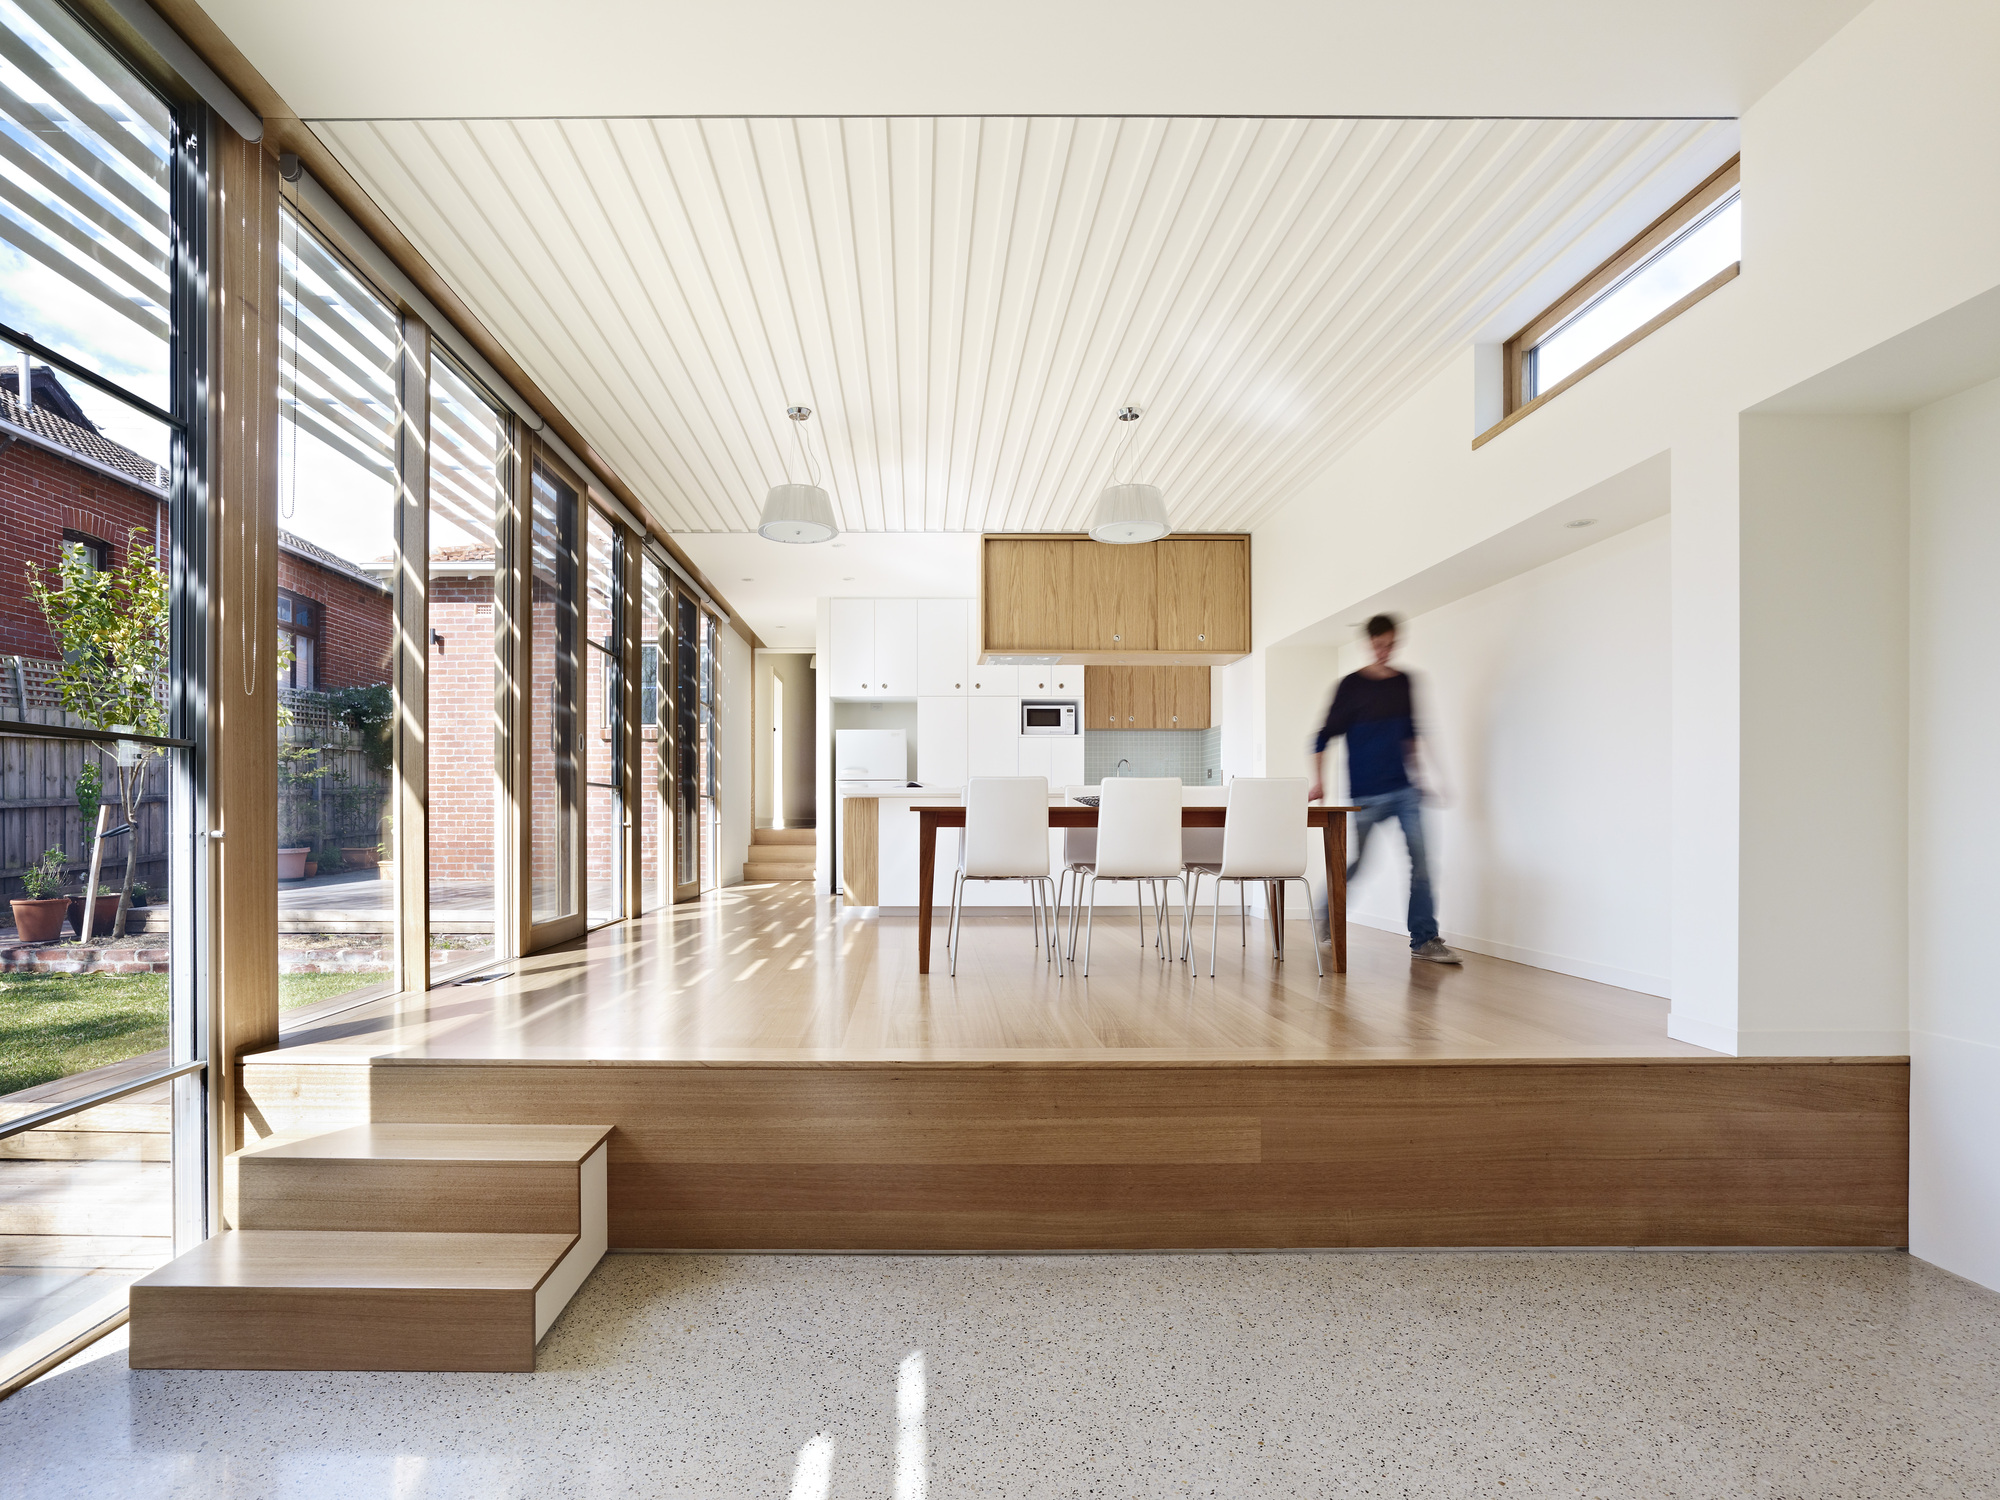 St. Kilda Side Yard House / Andrew Child Architect